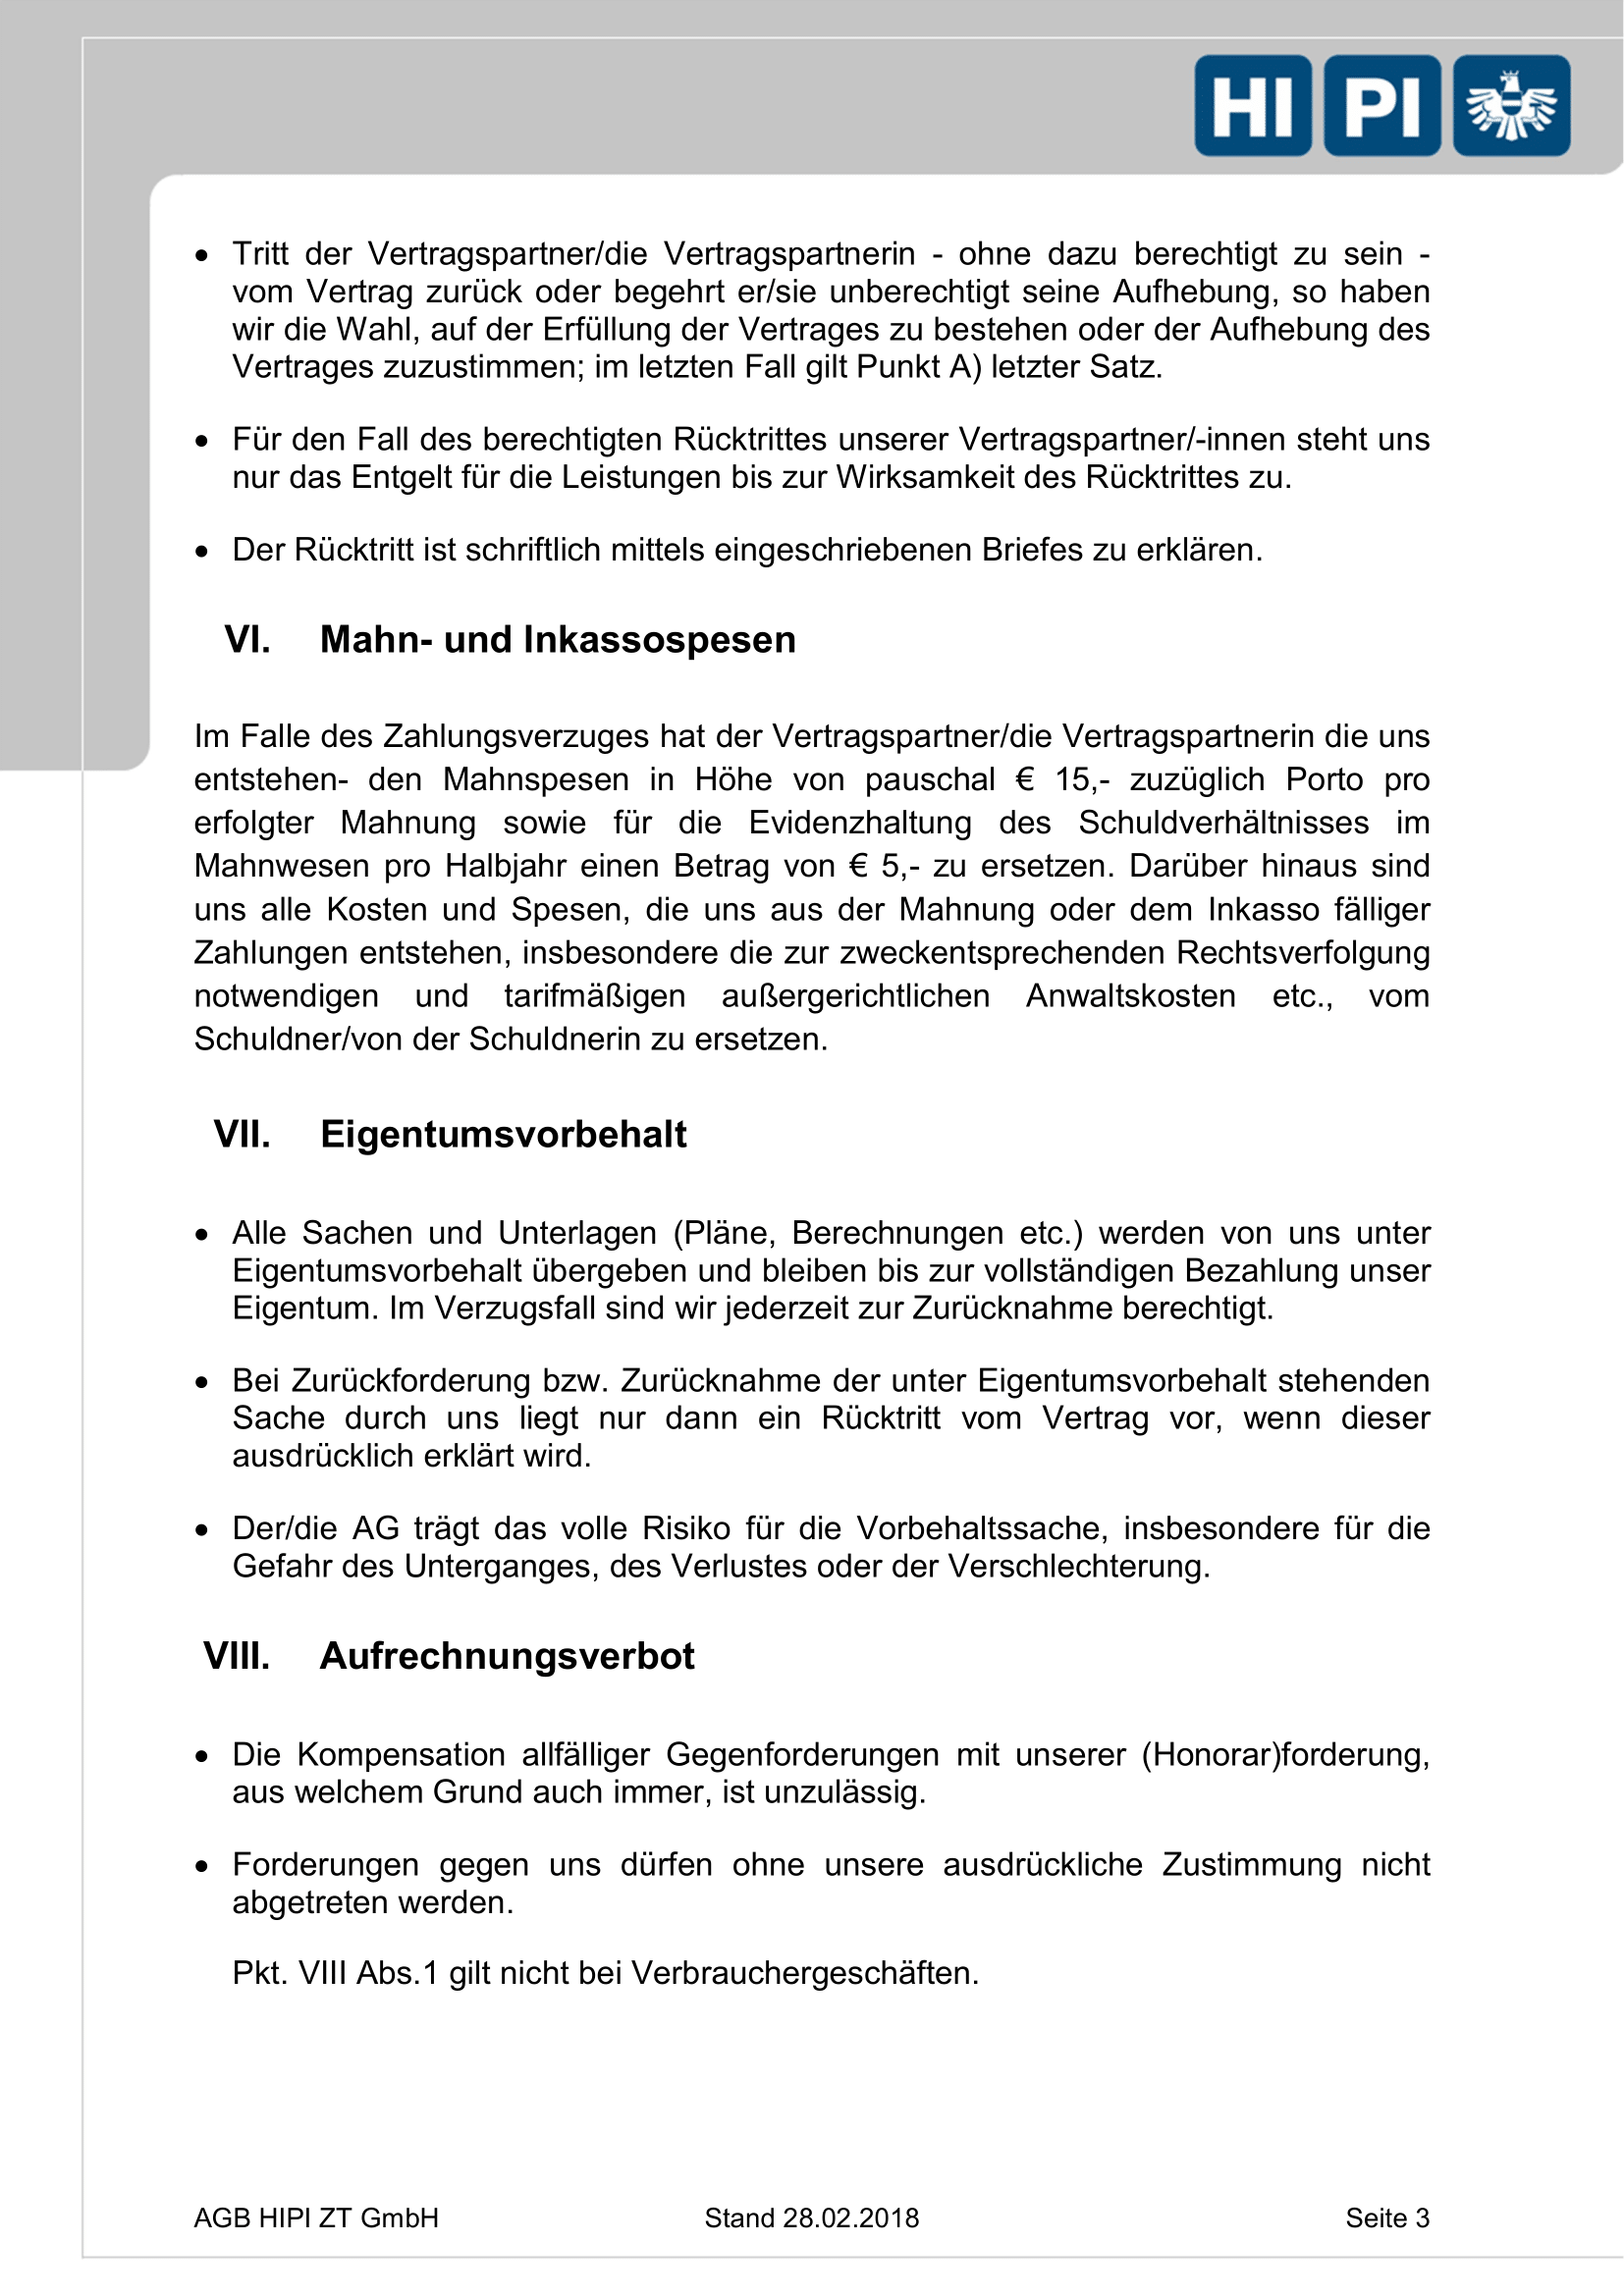 HIPI ZT GmbH AGB Seite 3